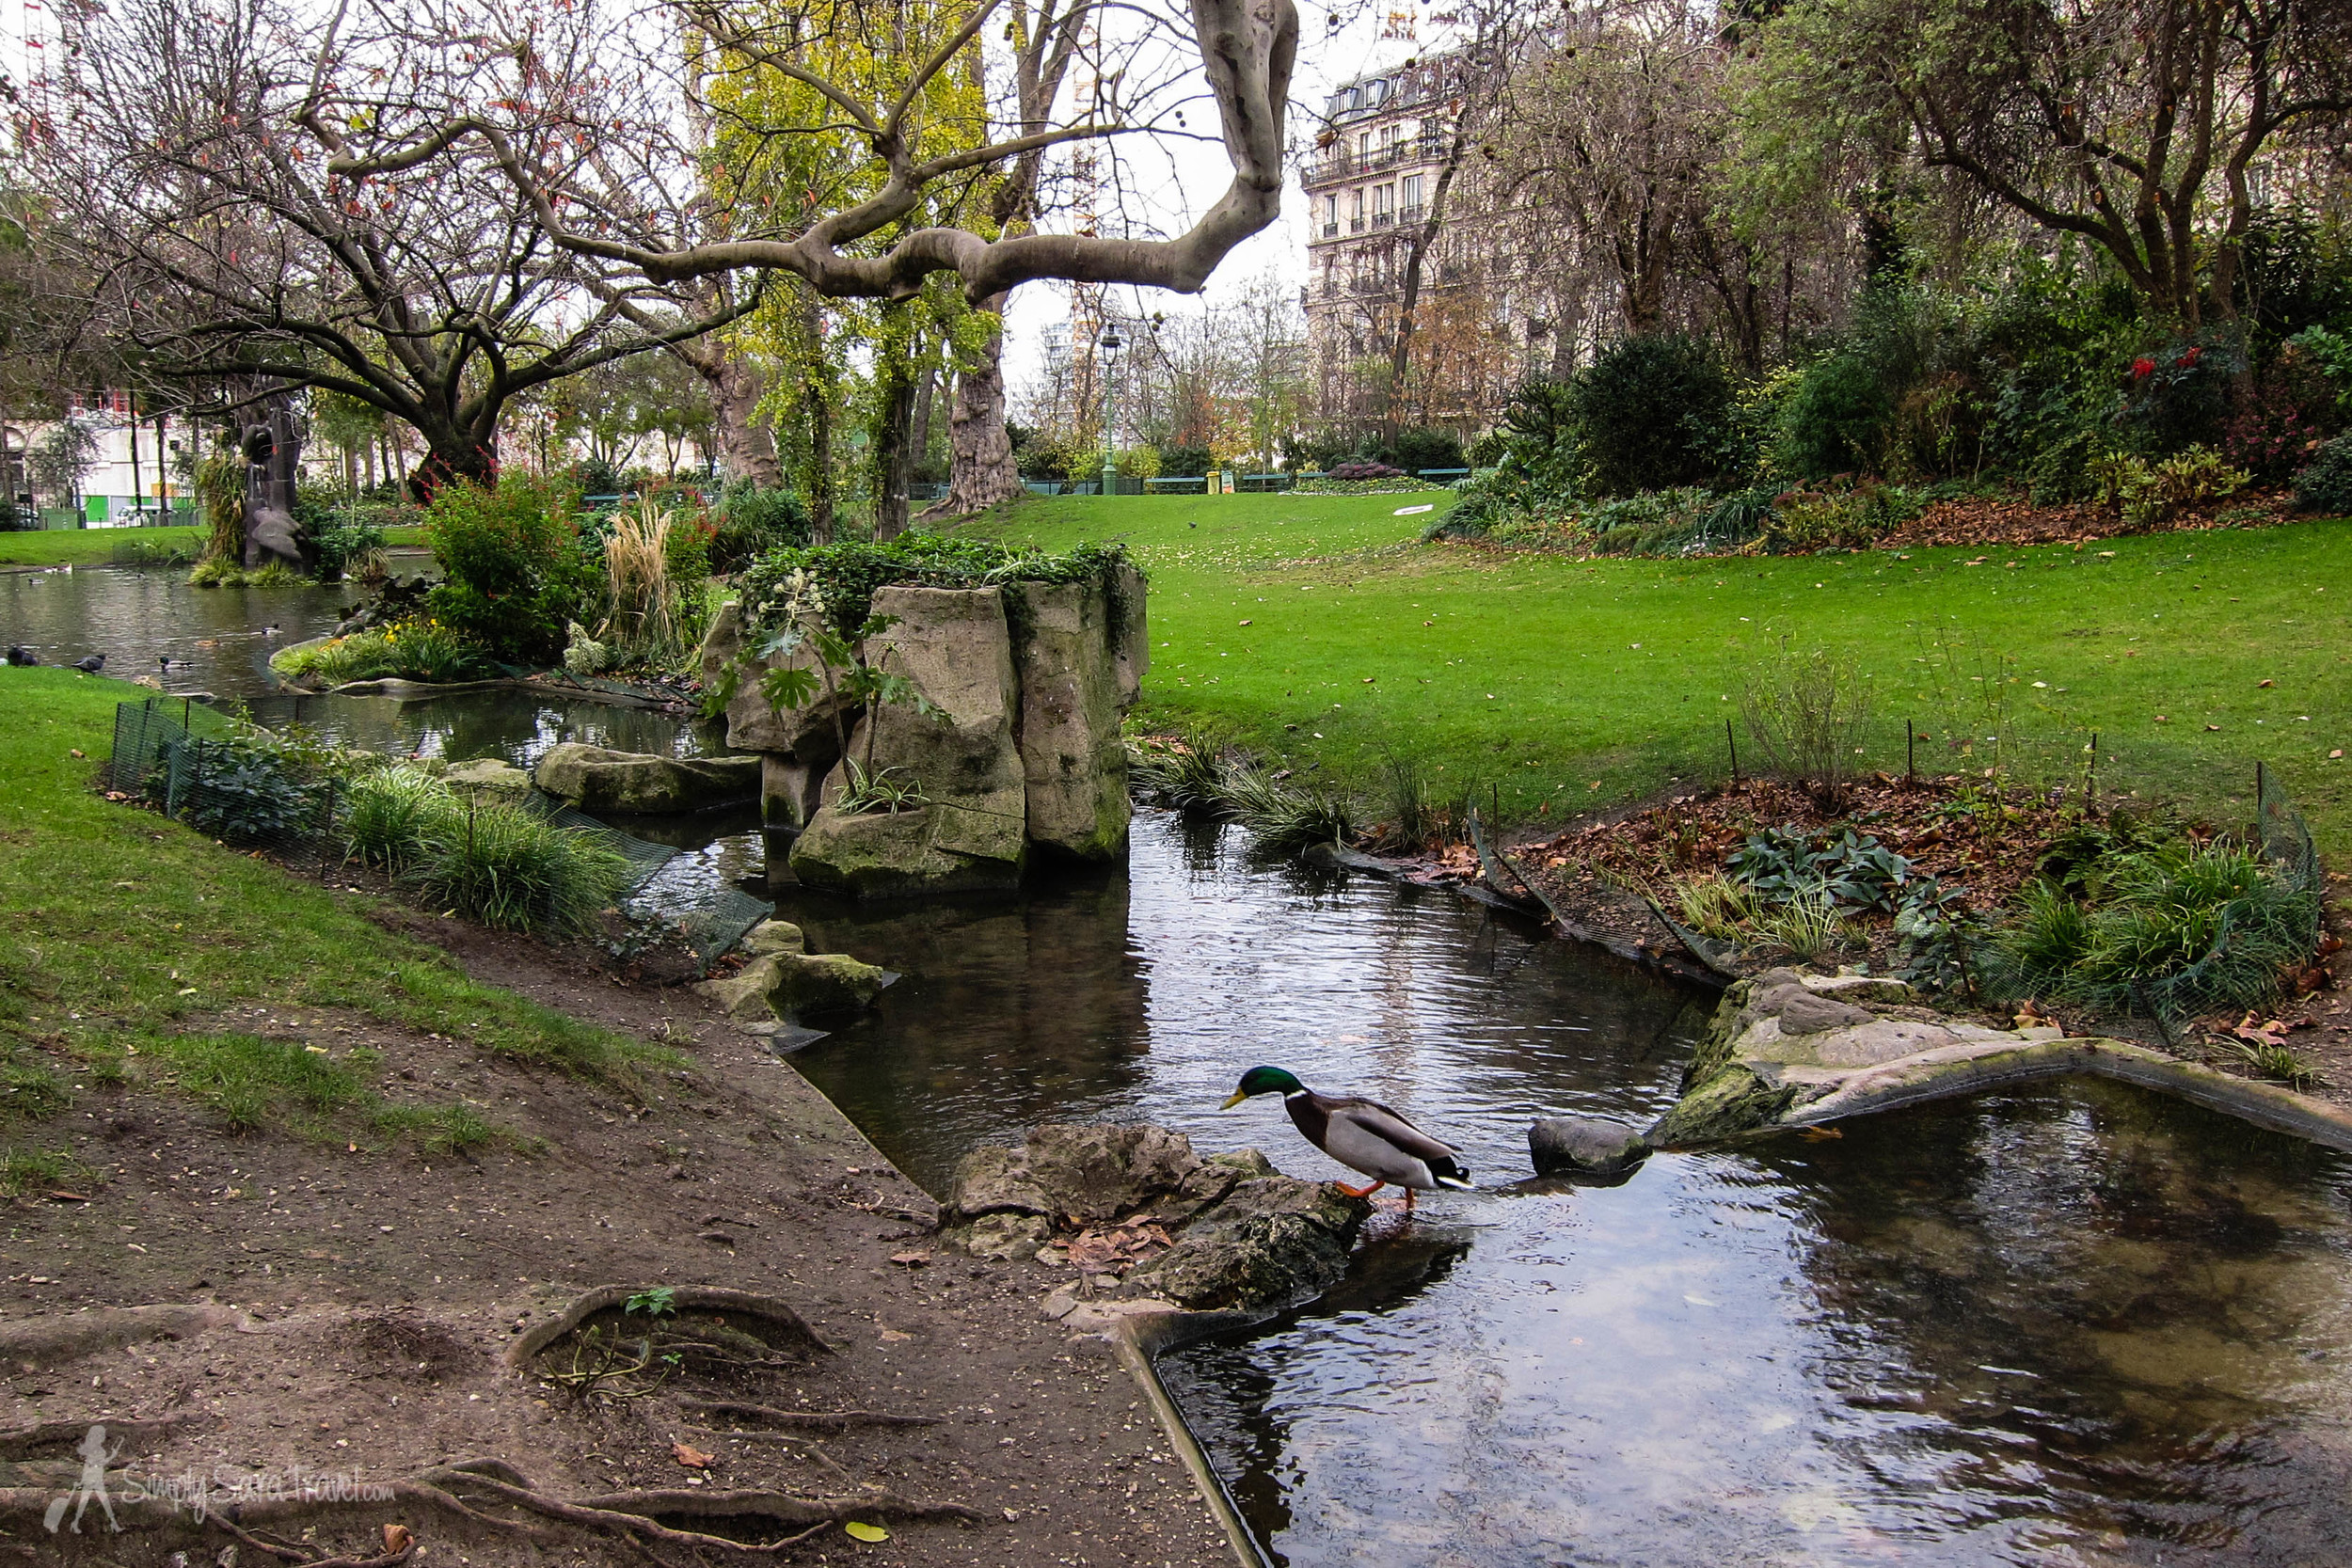 Ducks in Square des Batignolles, Paris, France, 17 arrondissement